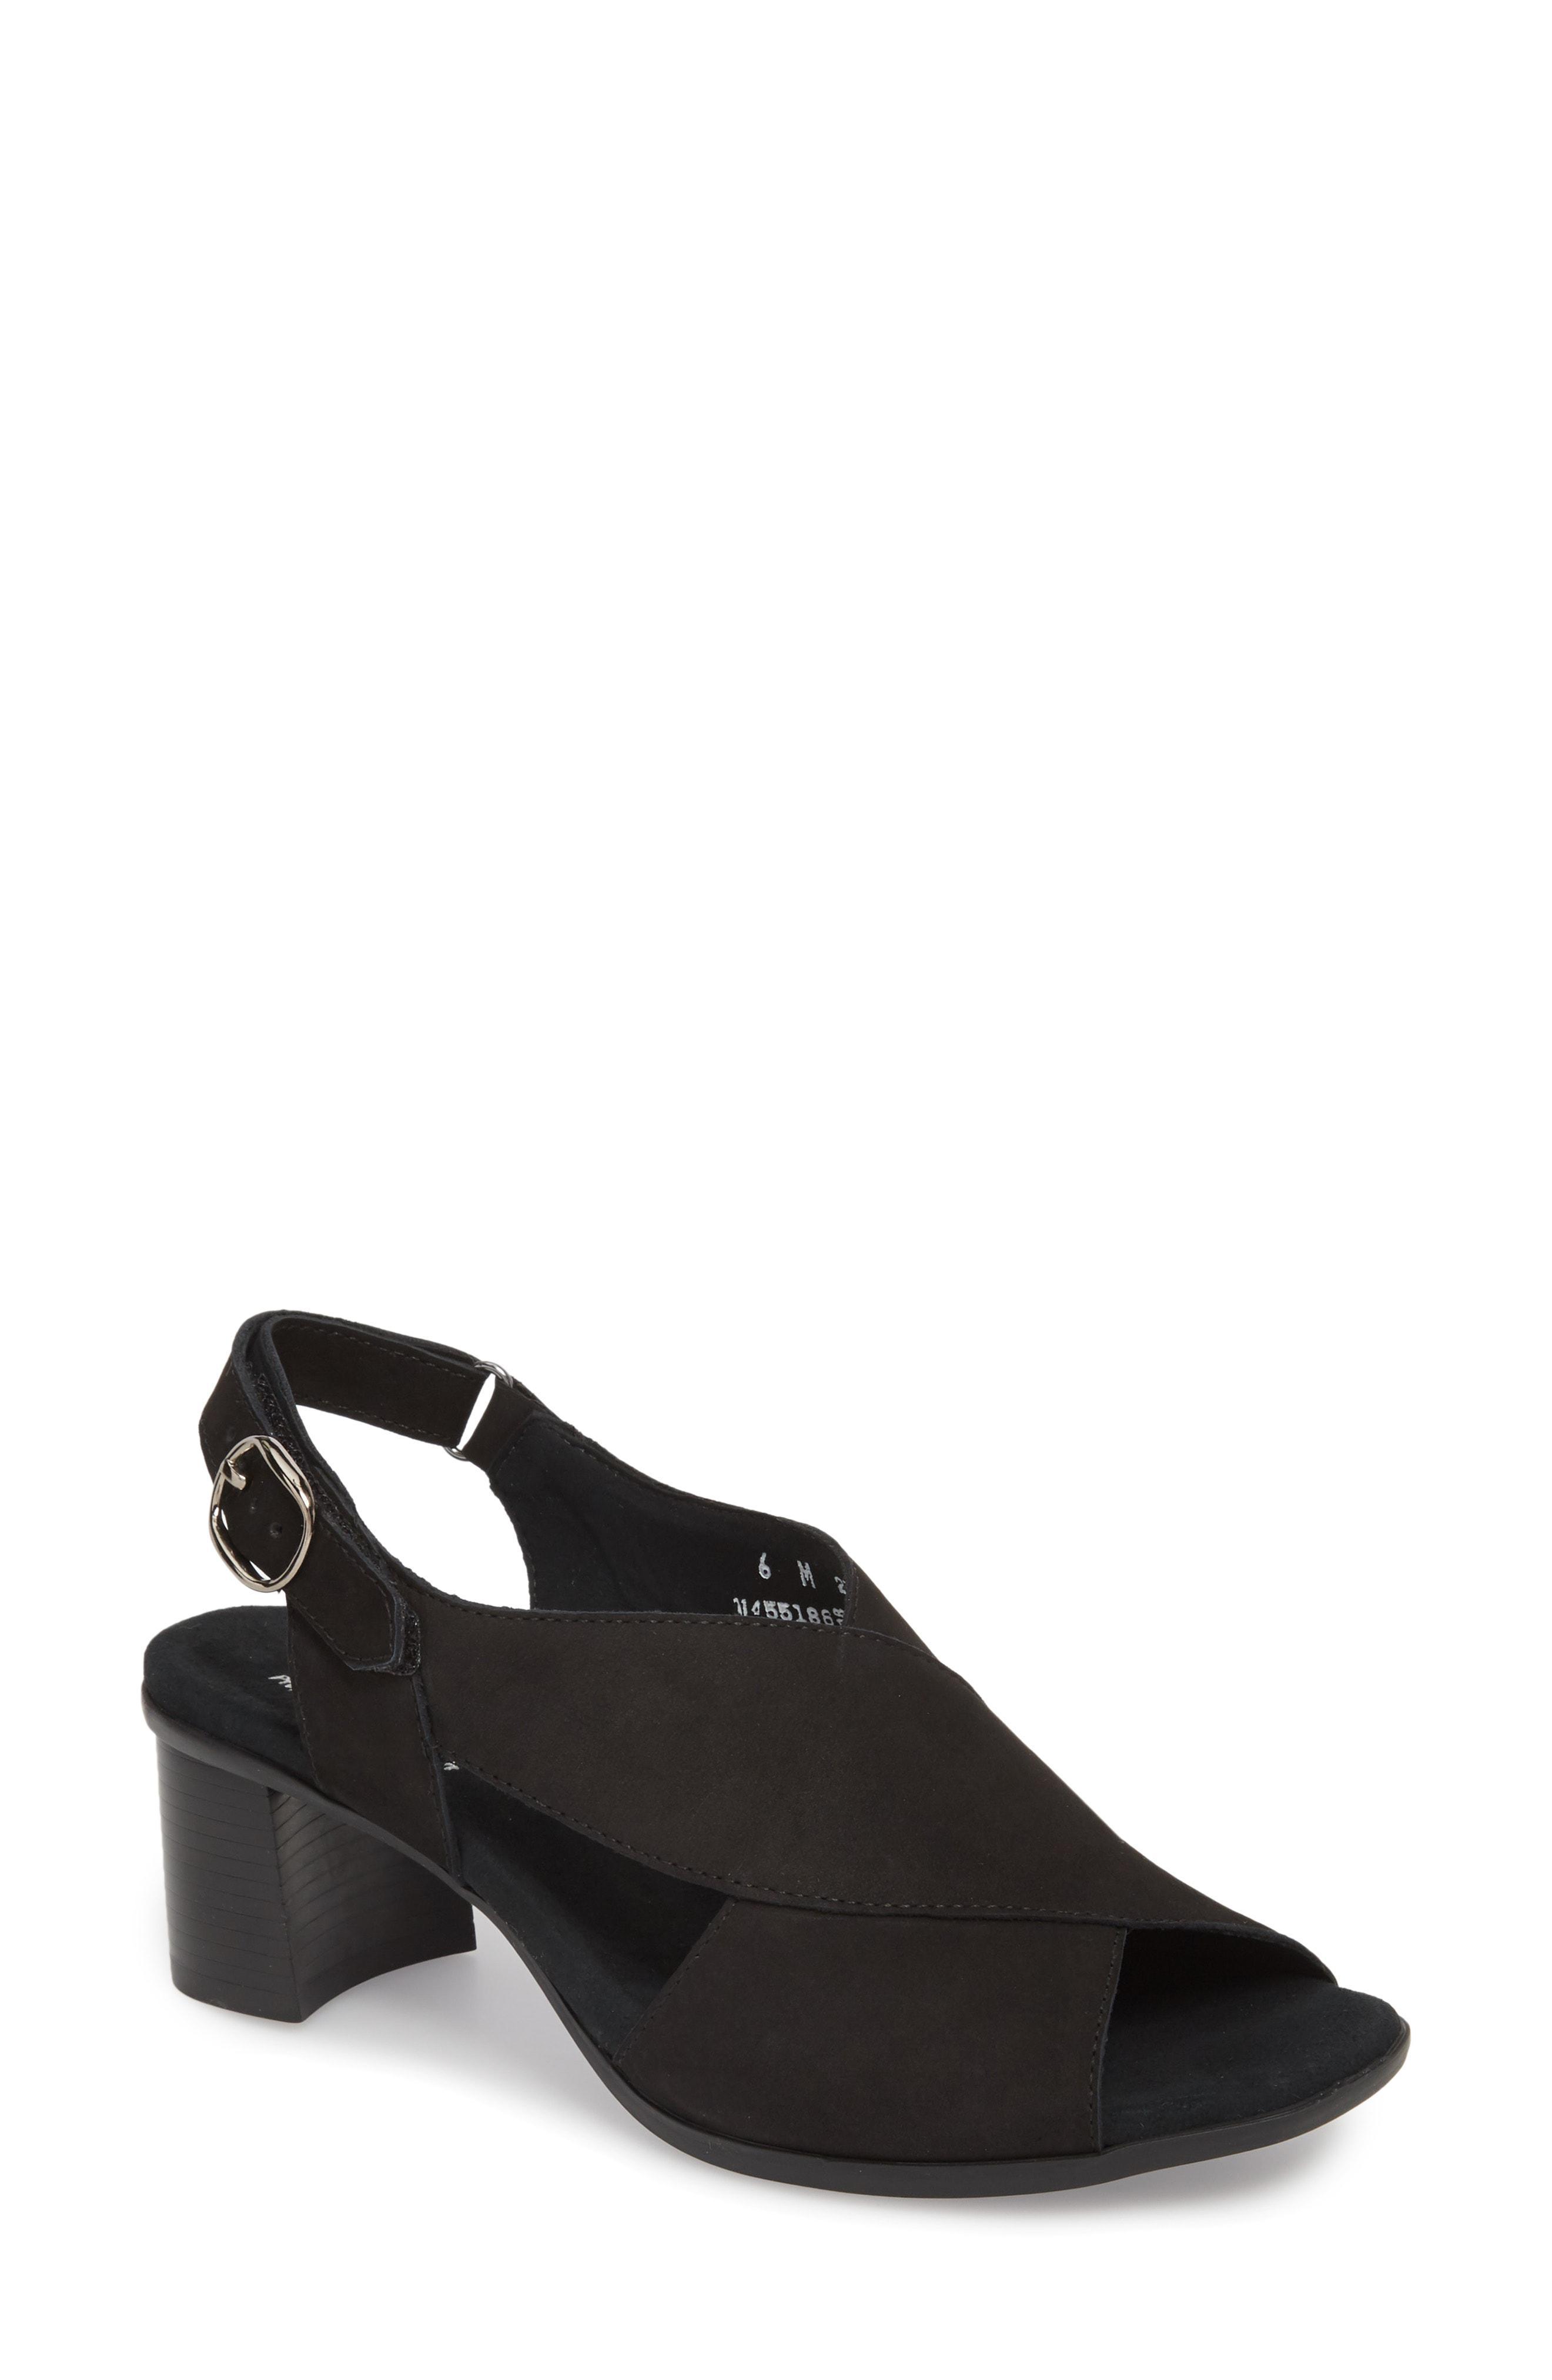 7cd88fd833f Lyst - Munro Laine Block Heel Sandal in Black - Save 60%